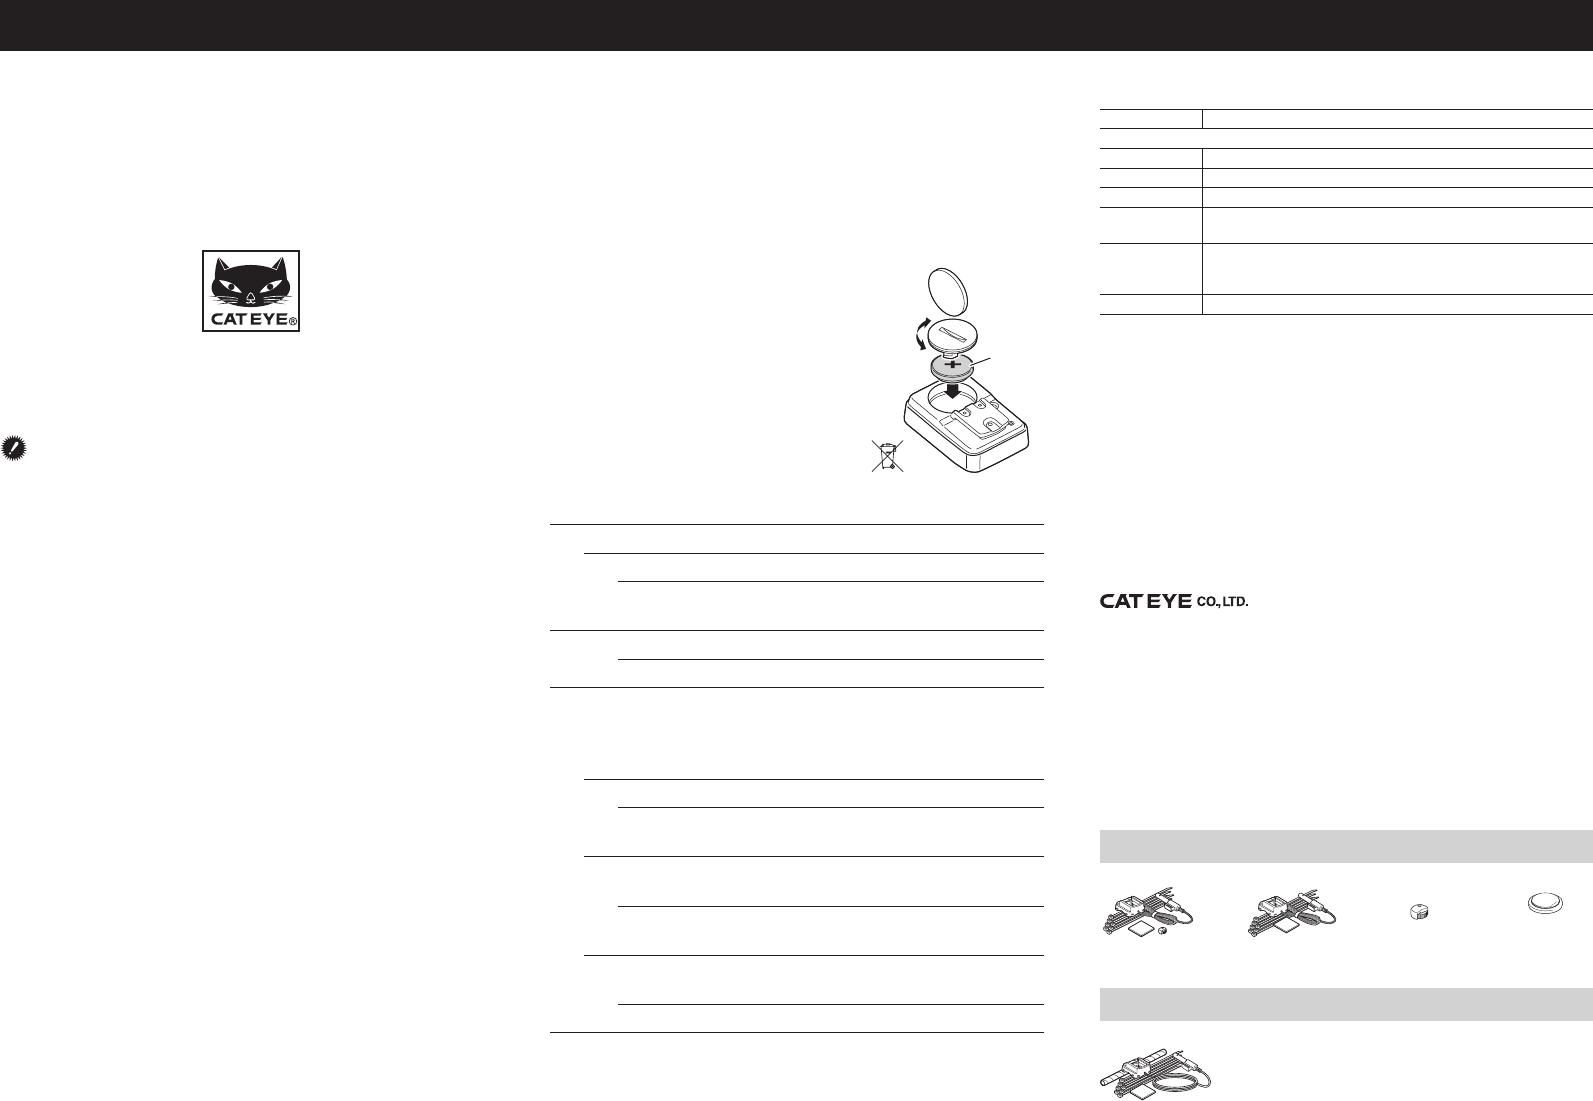 cateye velo 7 manual english